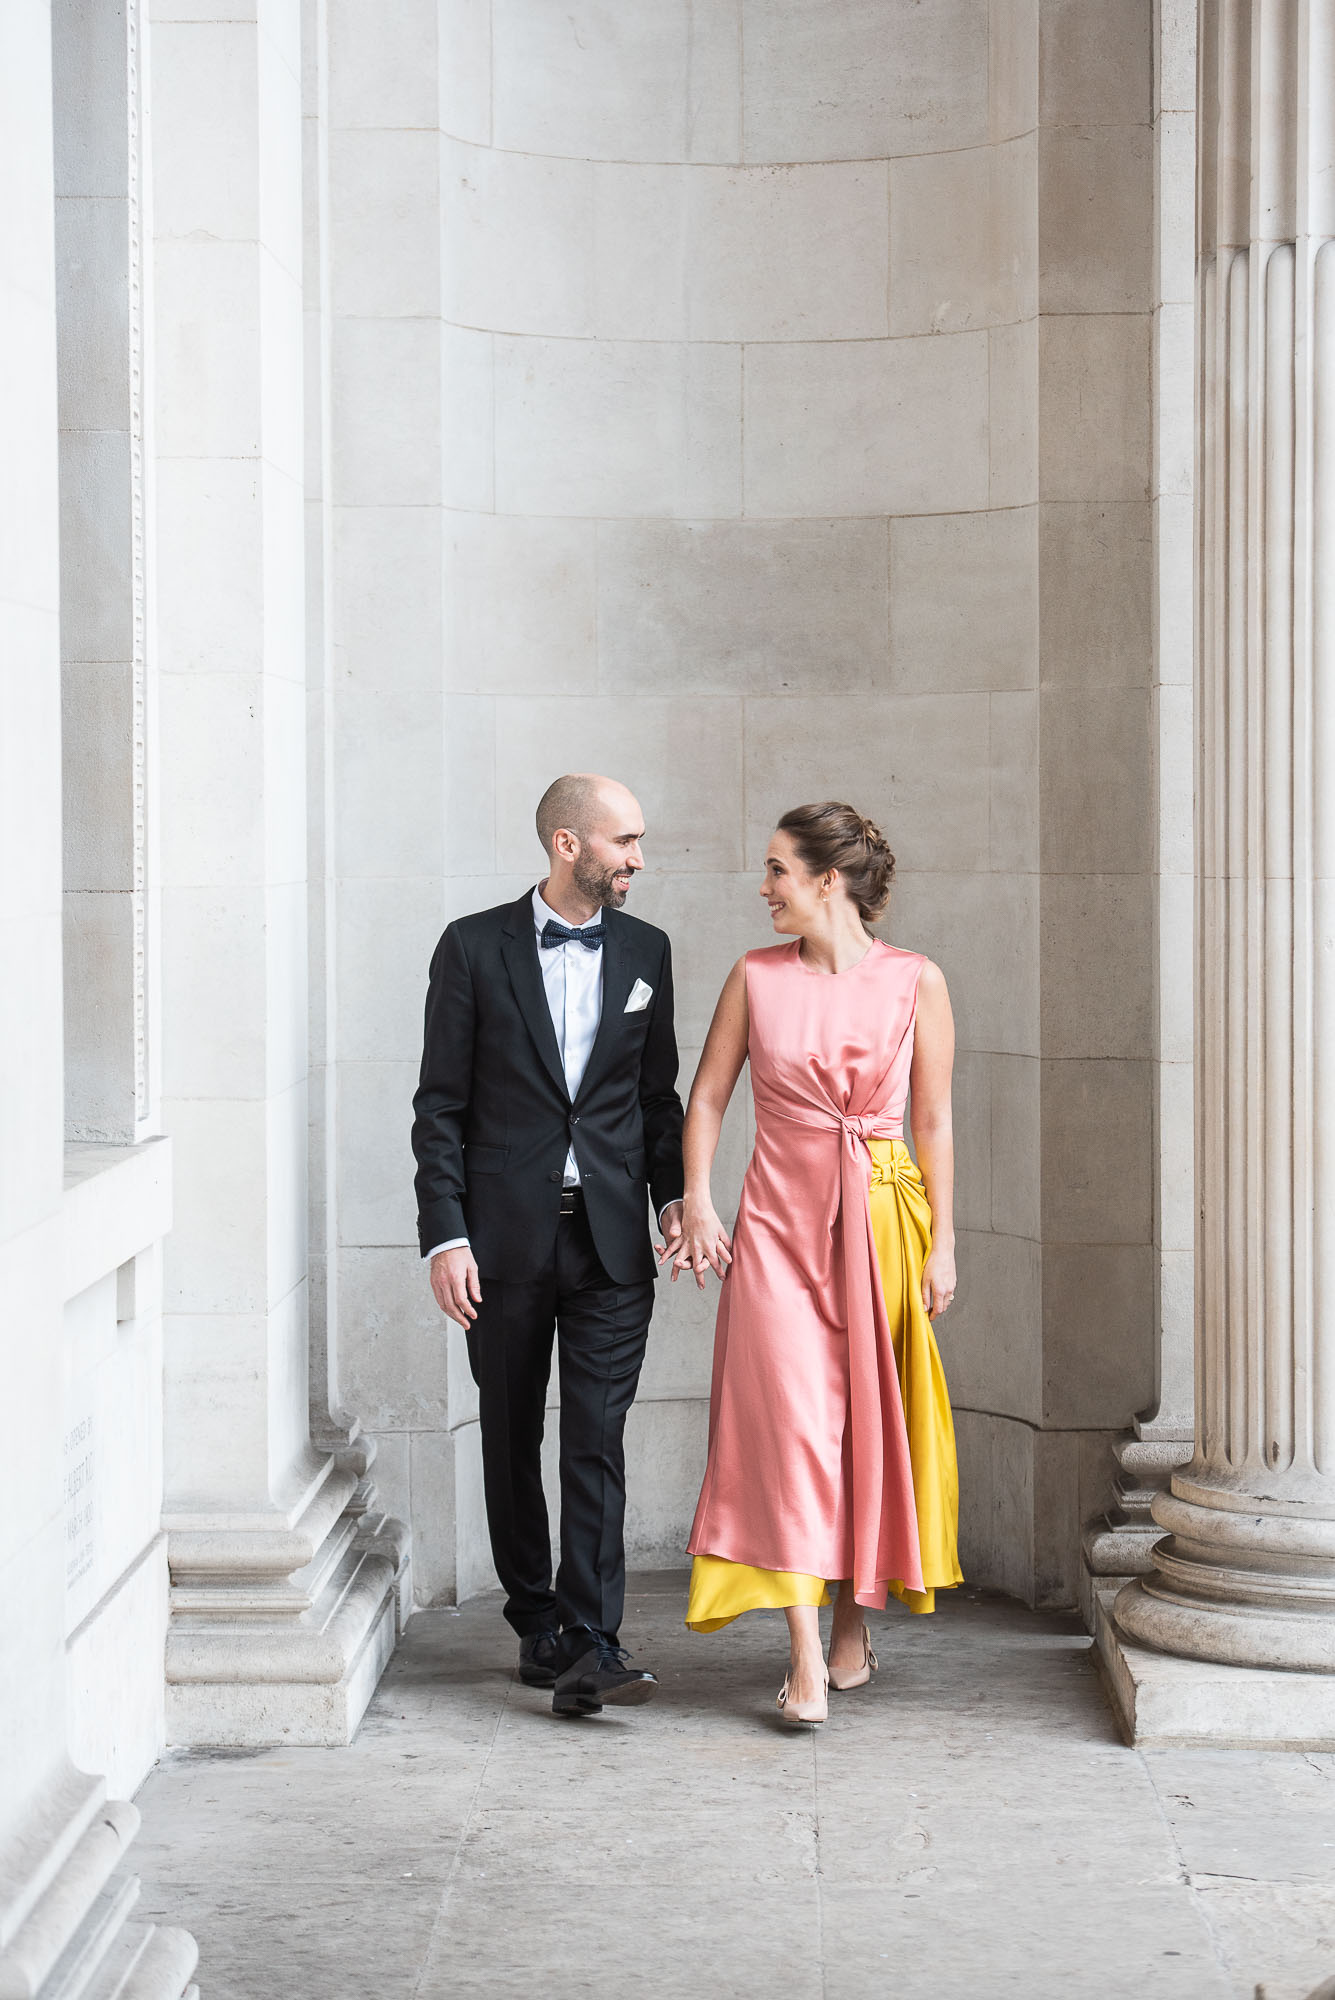 Our Wedding_HR (24 of 176).jpg